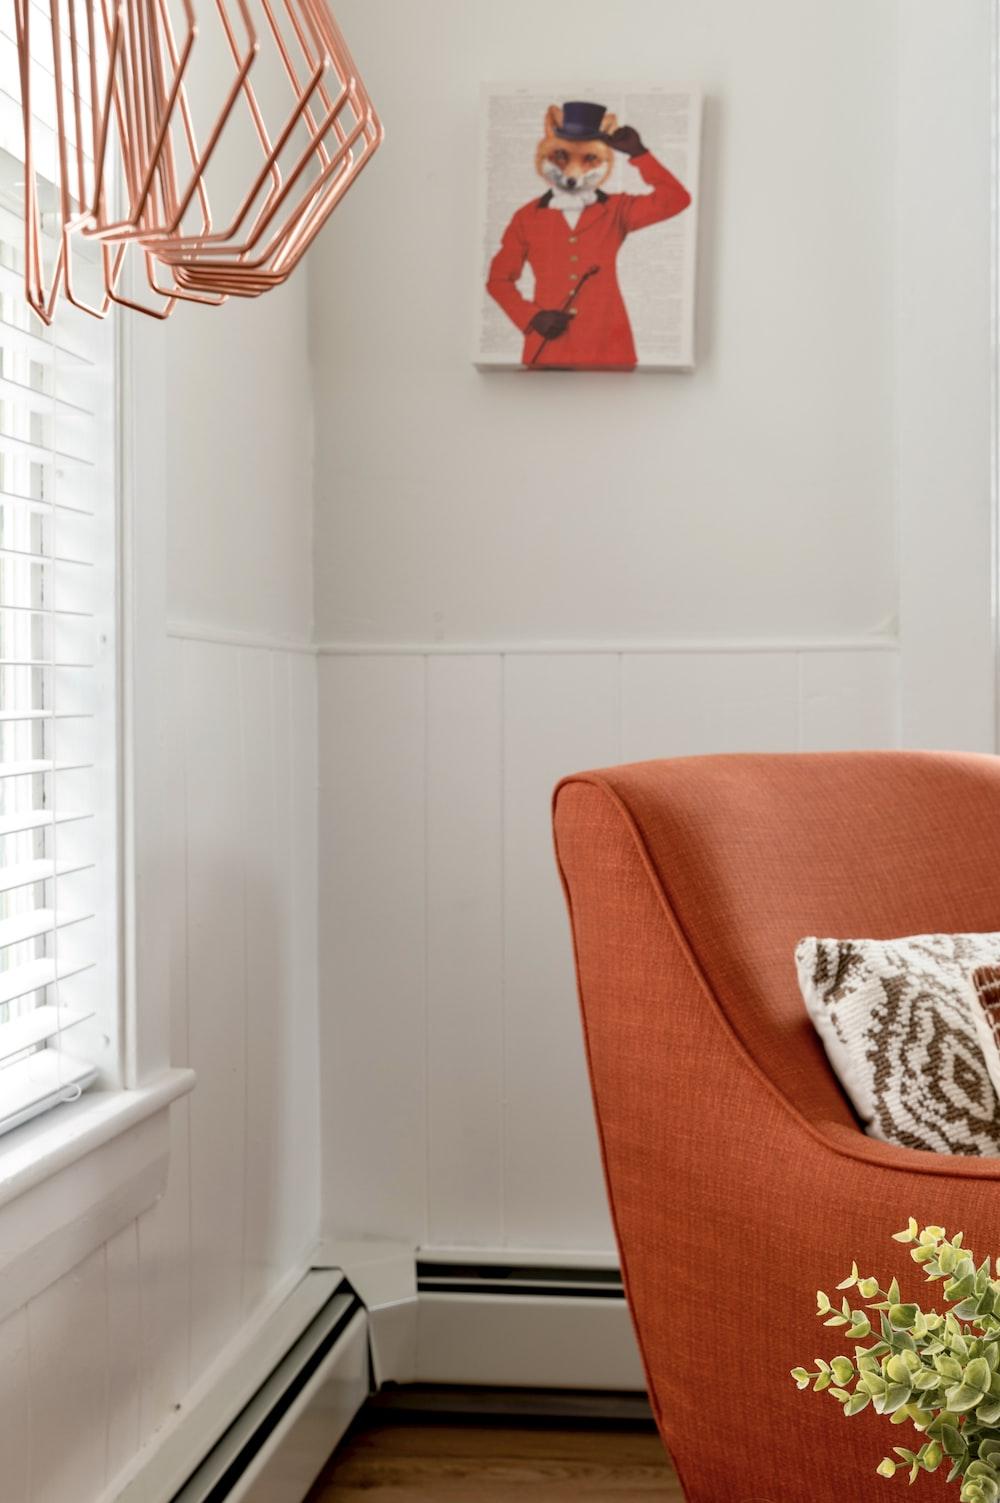 brown and white throw pillow on orange sofa chair